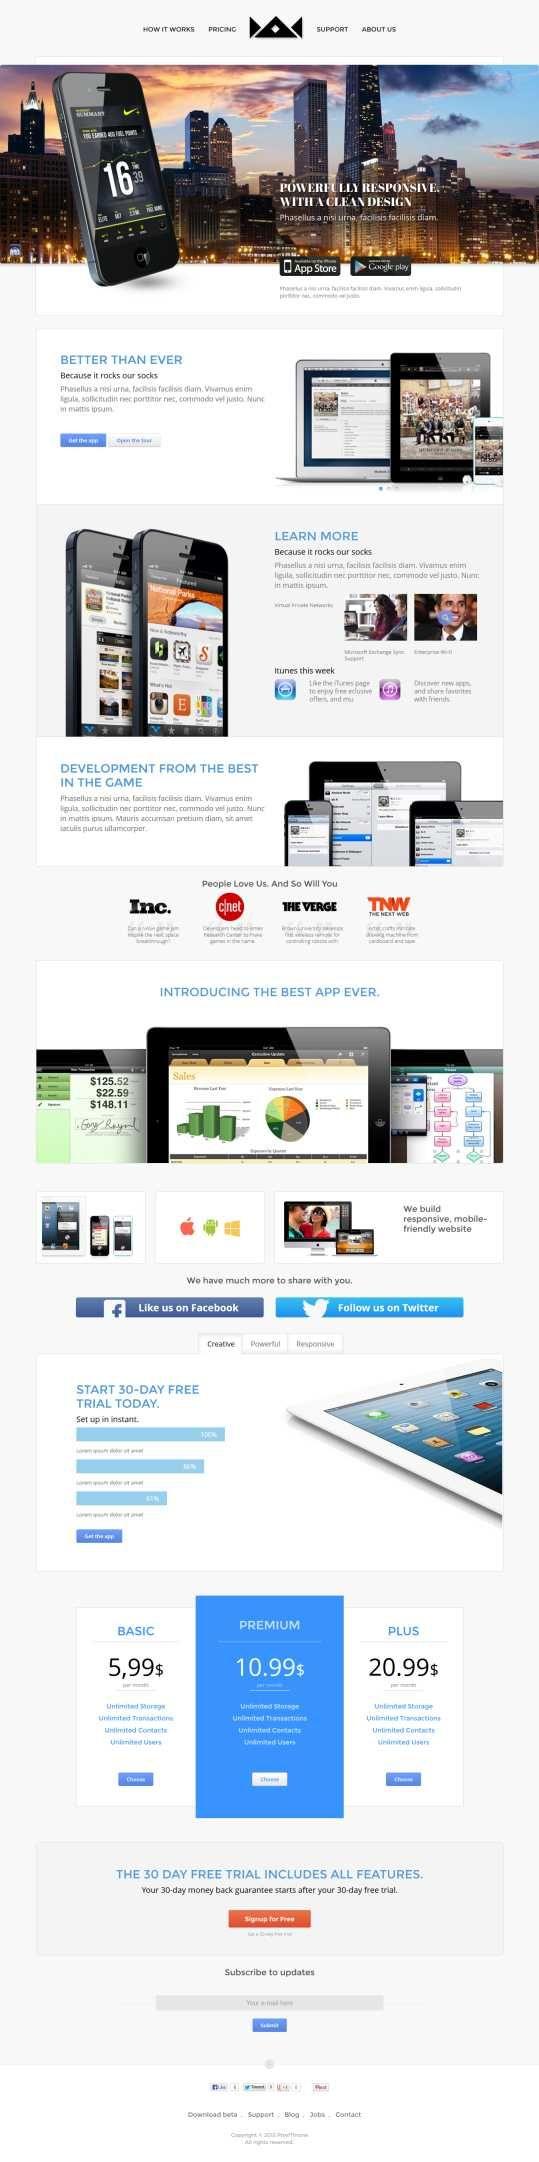 30+ Best WordPress Marketing / Corporate Themes & Templates. #best_wordpress_themes_2013